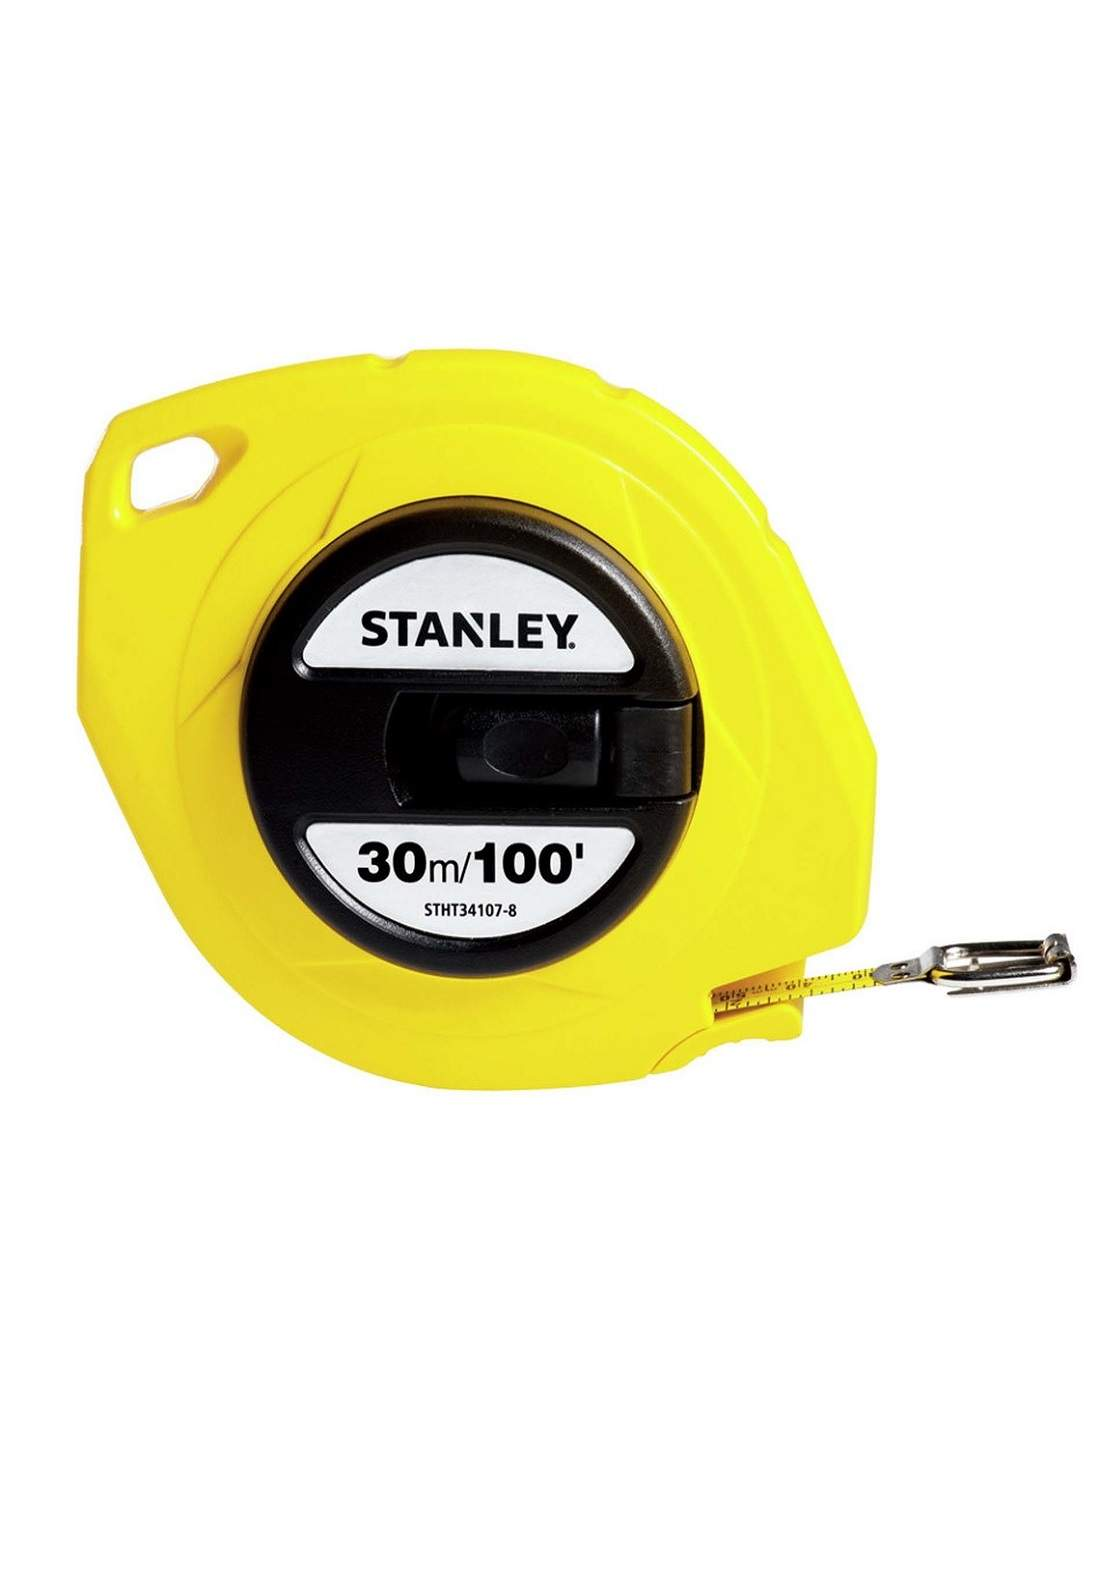 Stanley STHT34107-8  Measuring Tape 30M/E x 10mm فيتة  30 م